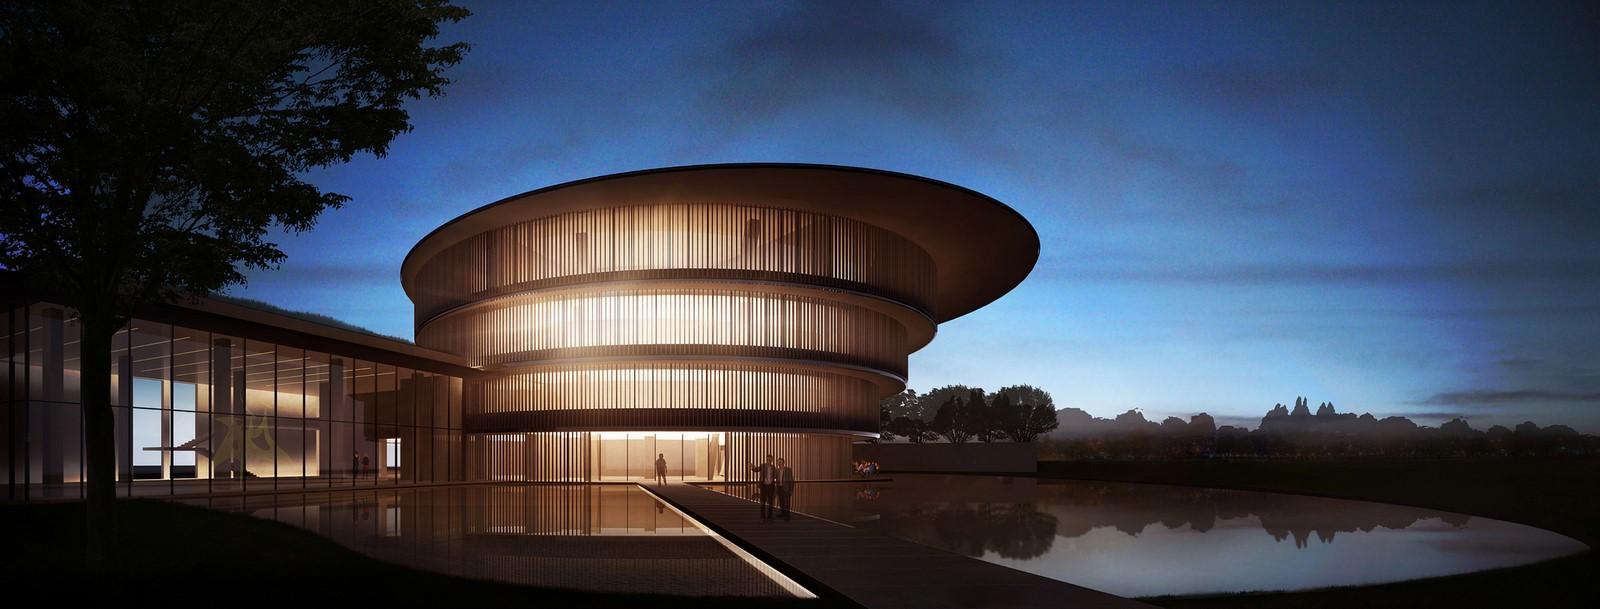 HE Art Museum by Tadao Ando: A place of harmony - Sheet1